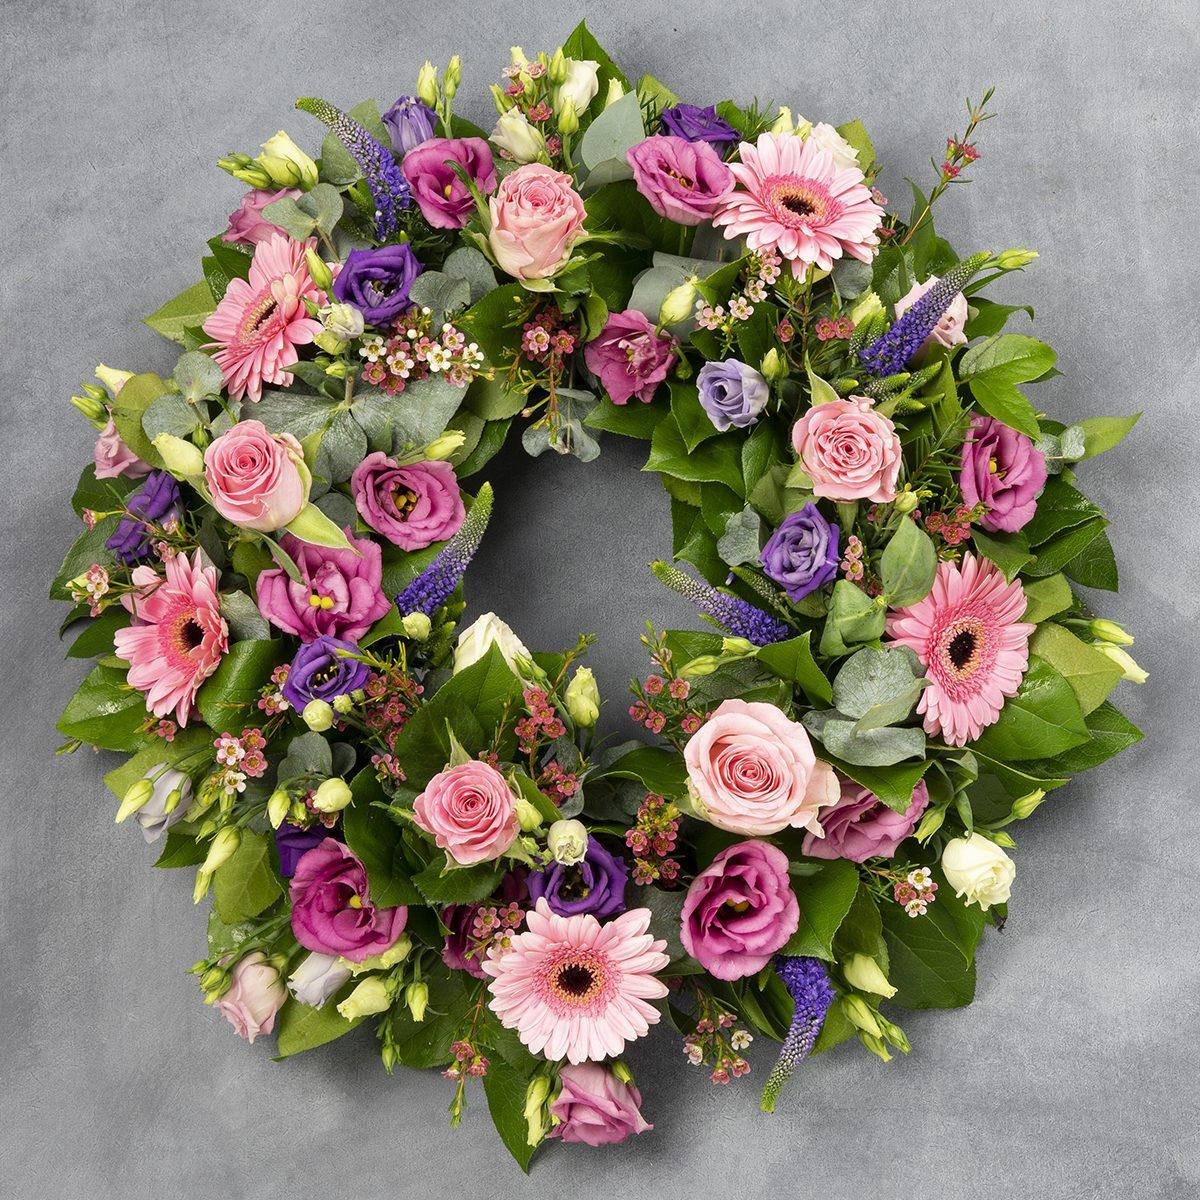 sympathy flowers online, funeral flowers